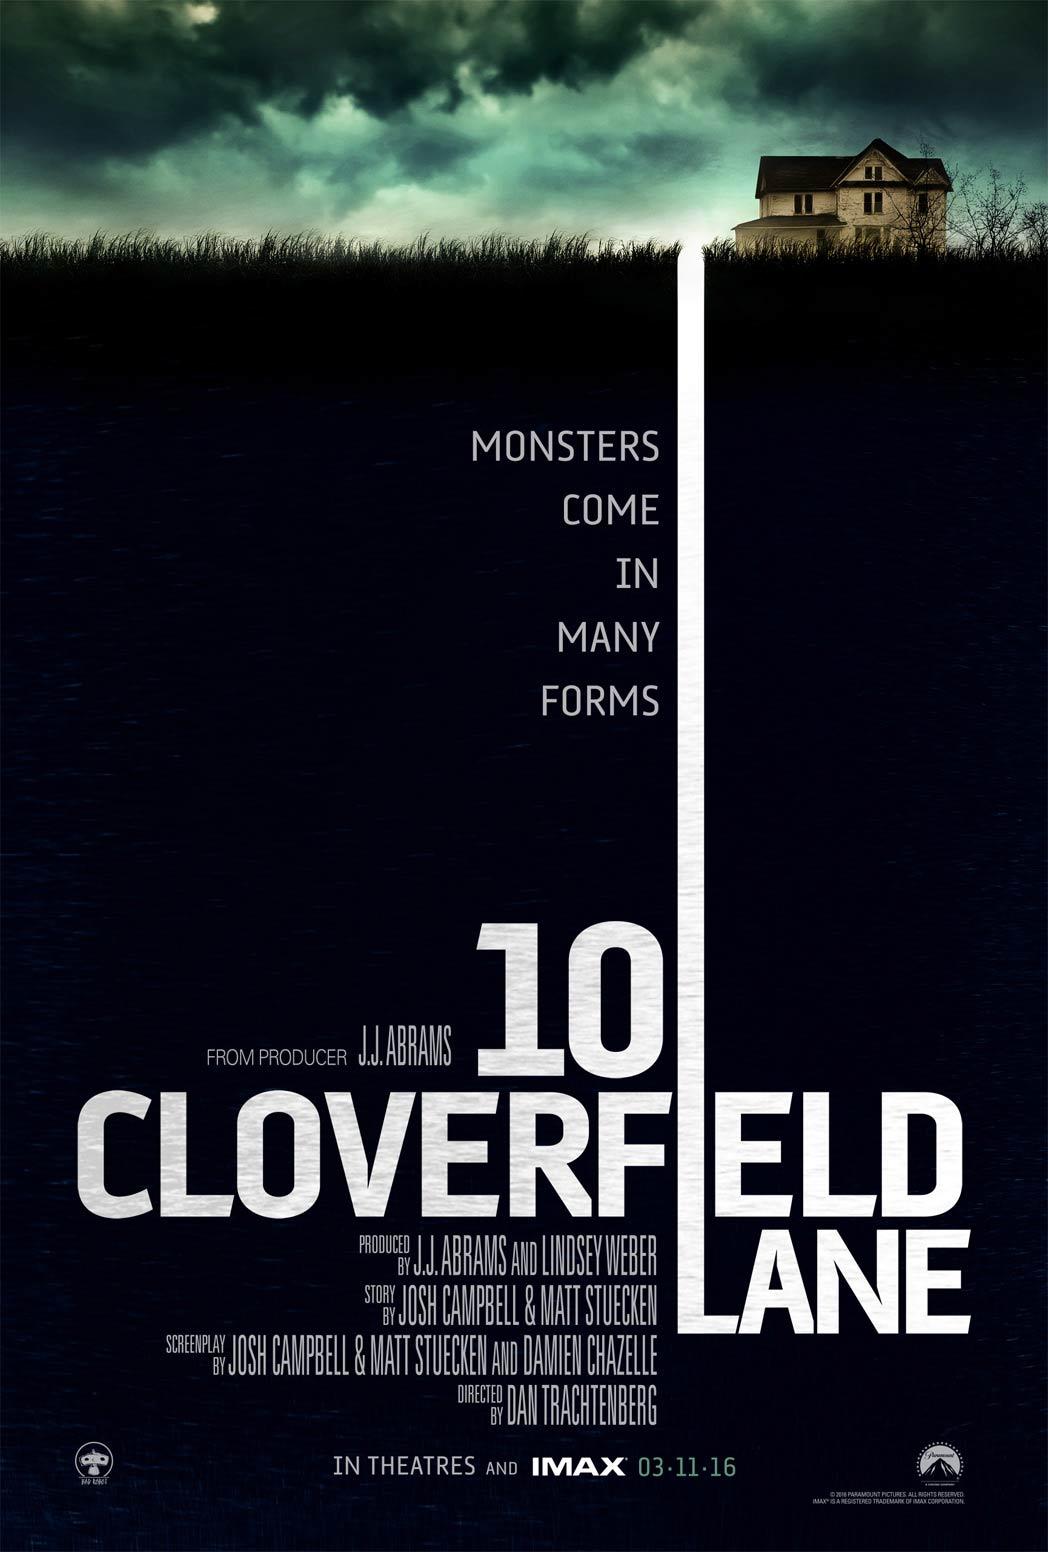 10 Cloverfield Lane Image